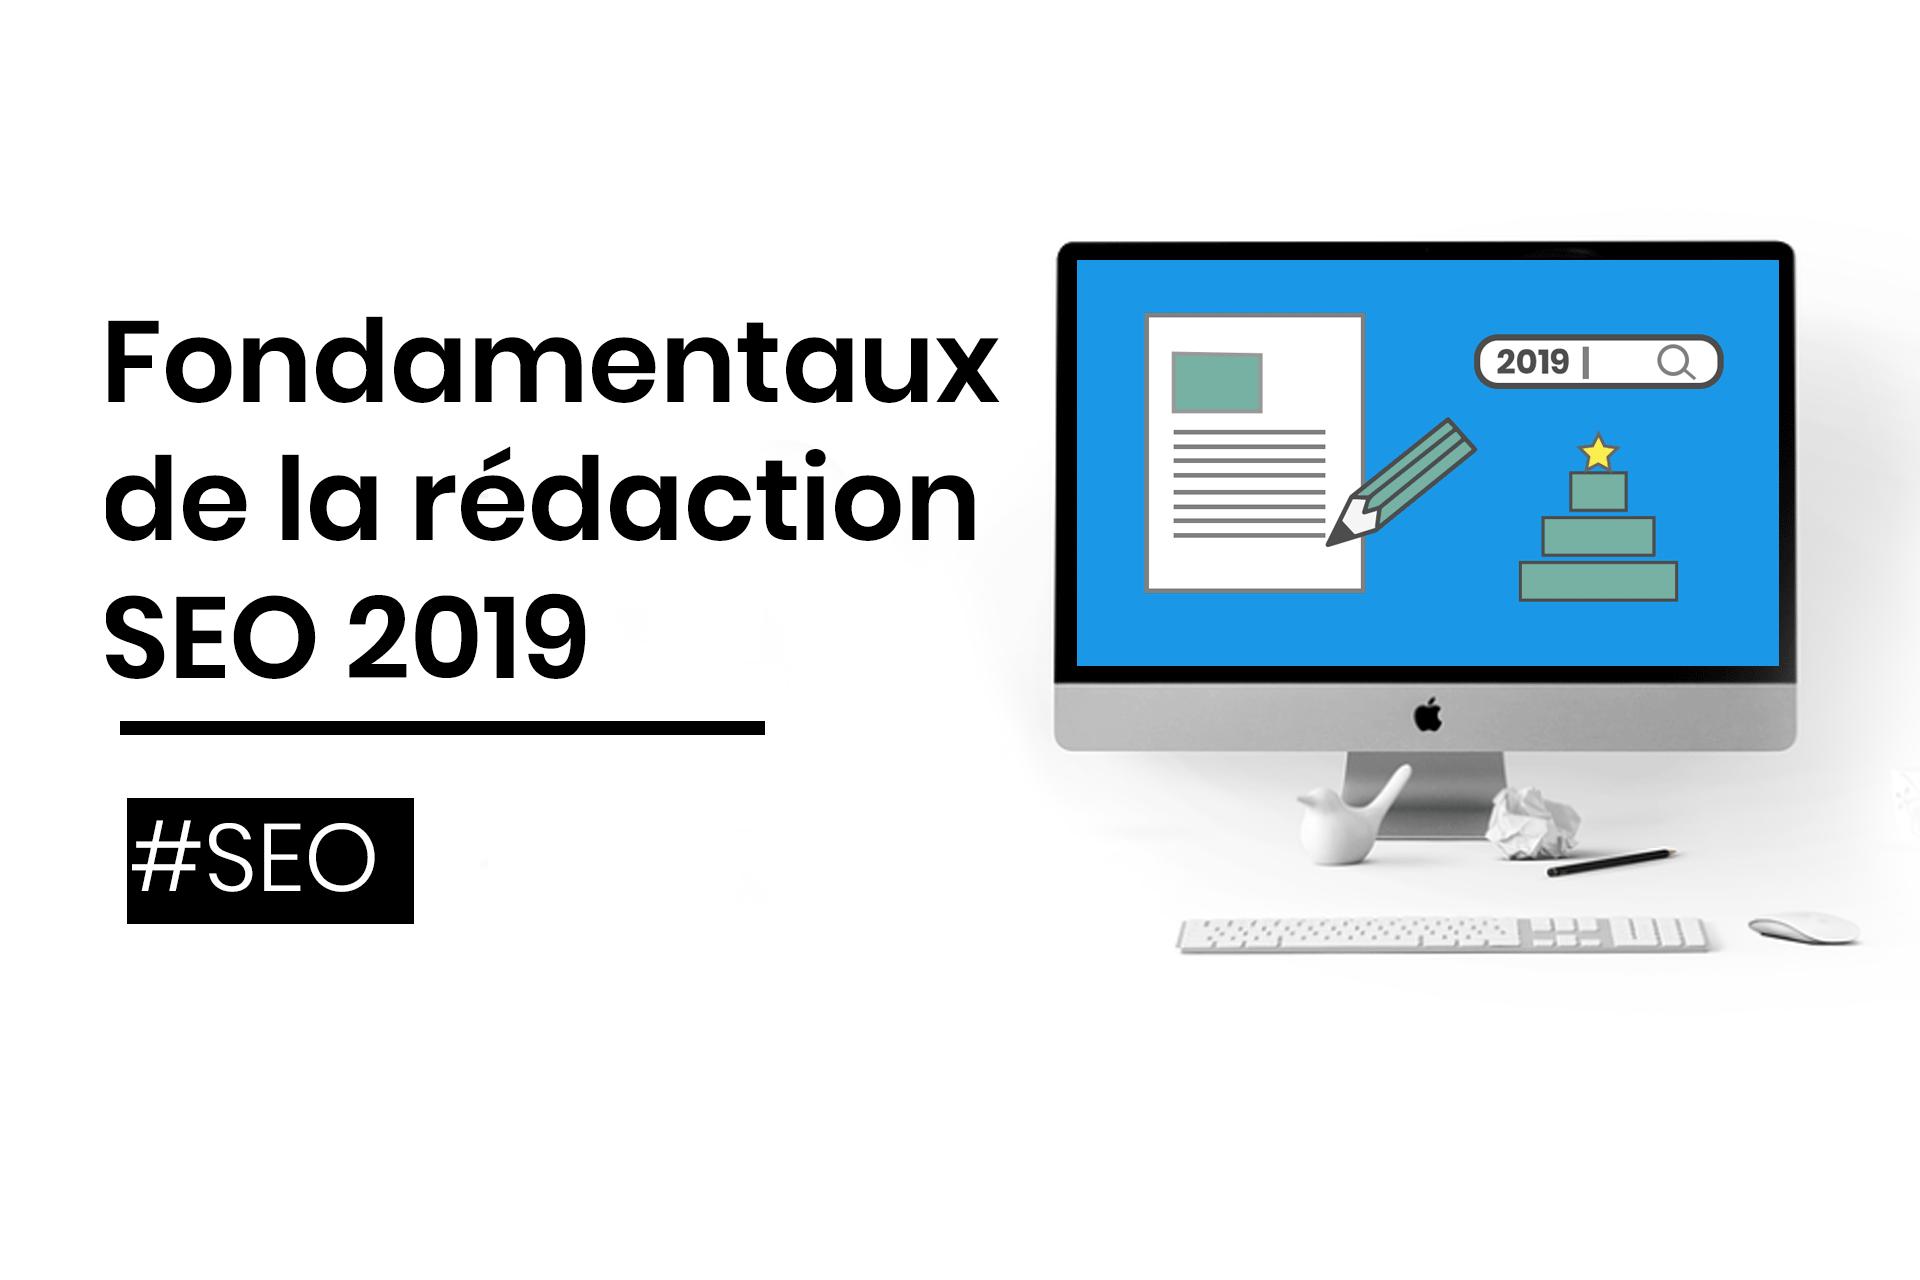 fondamentaux-redaction-seo-2019